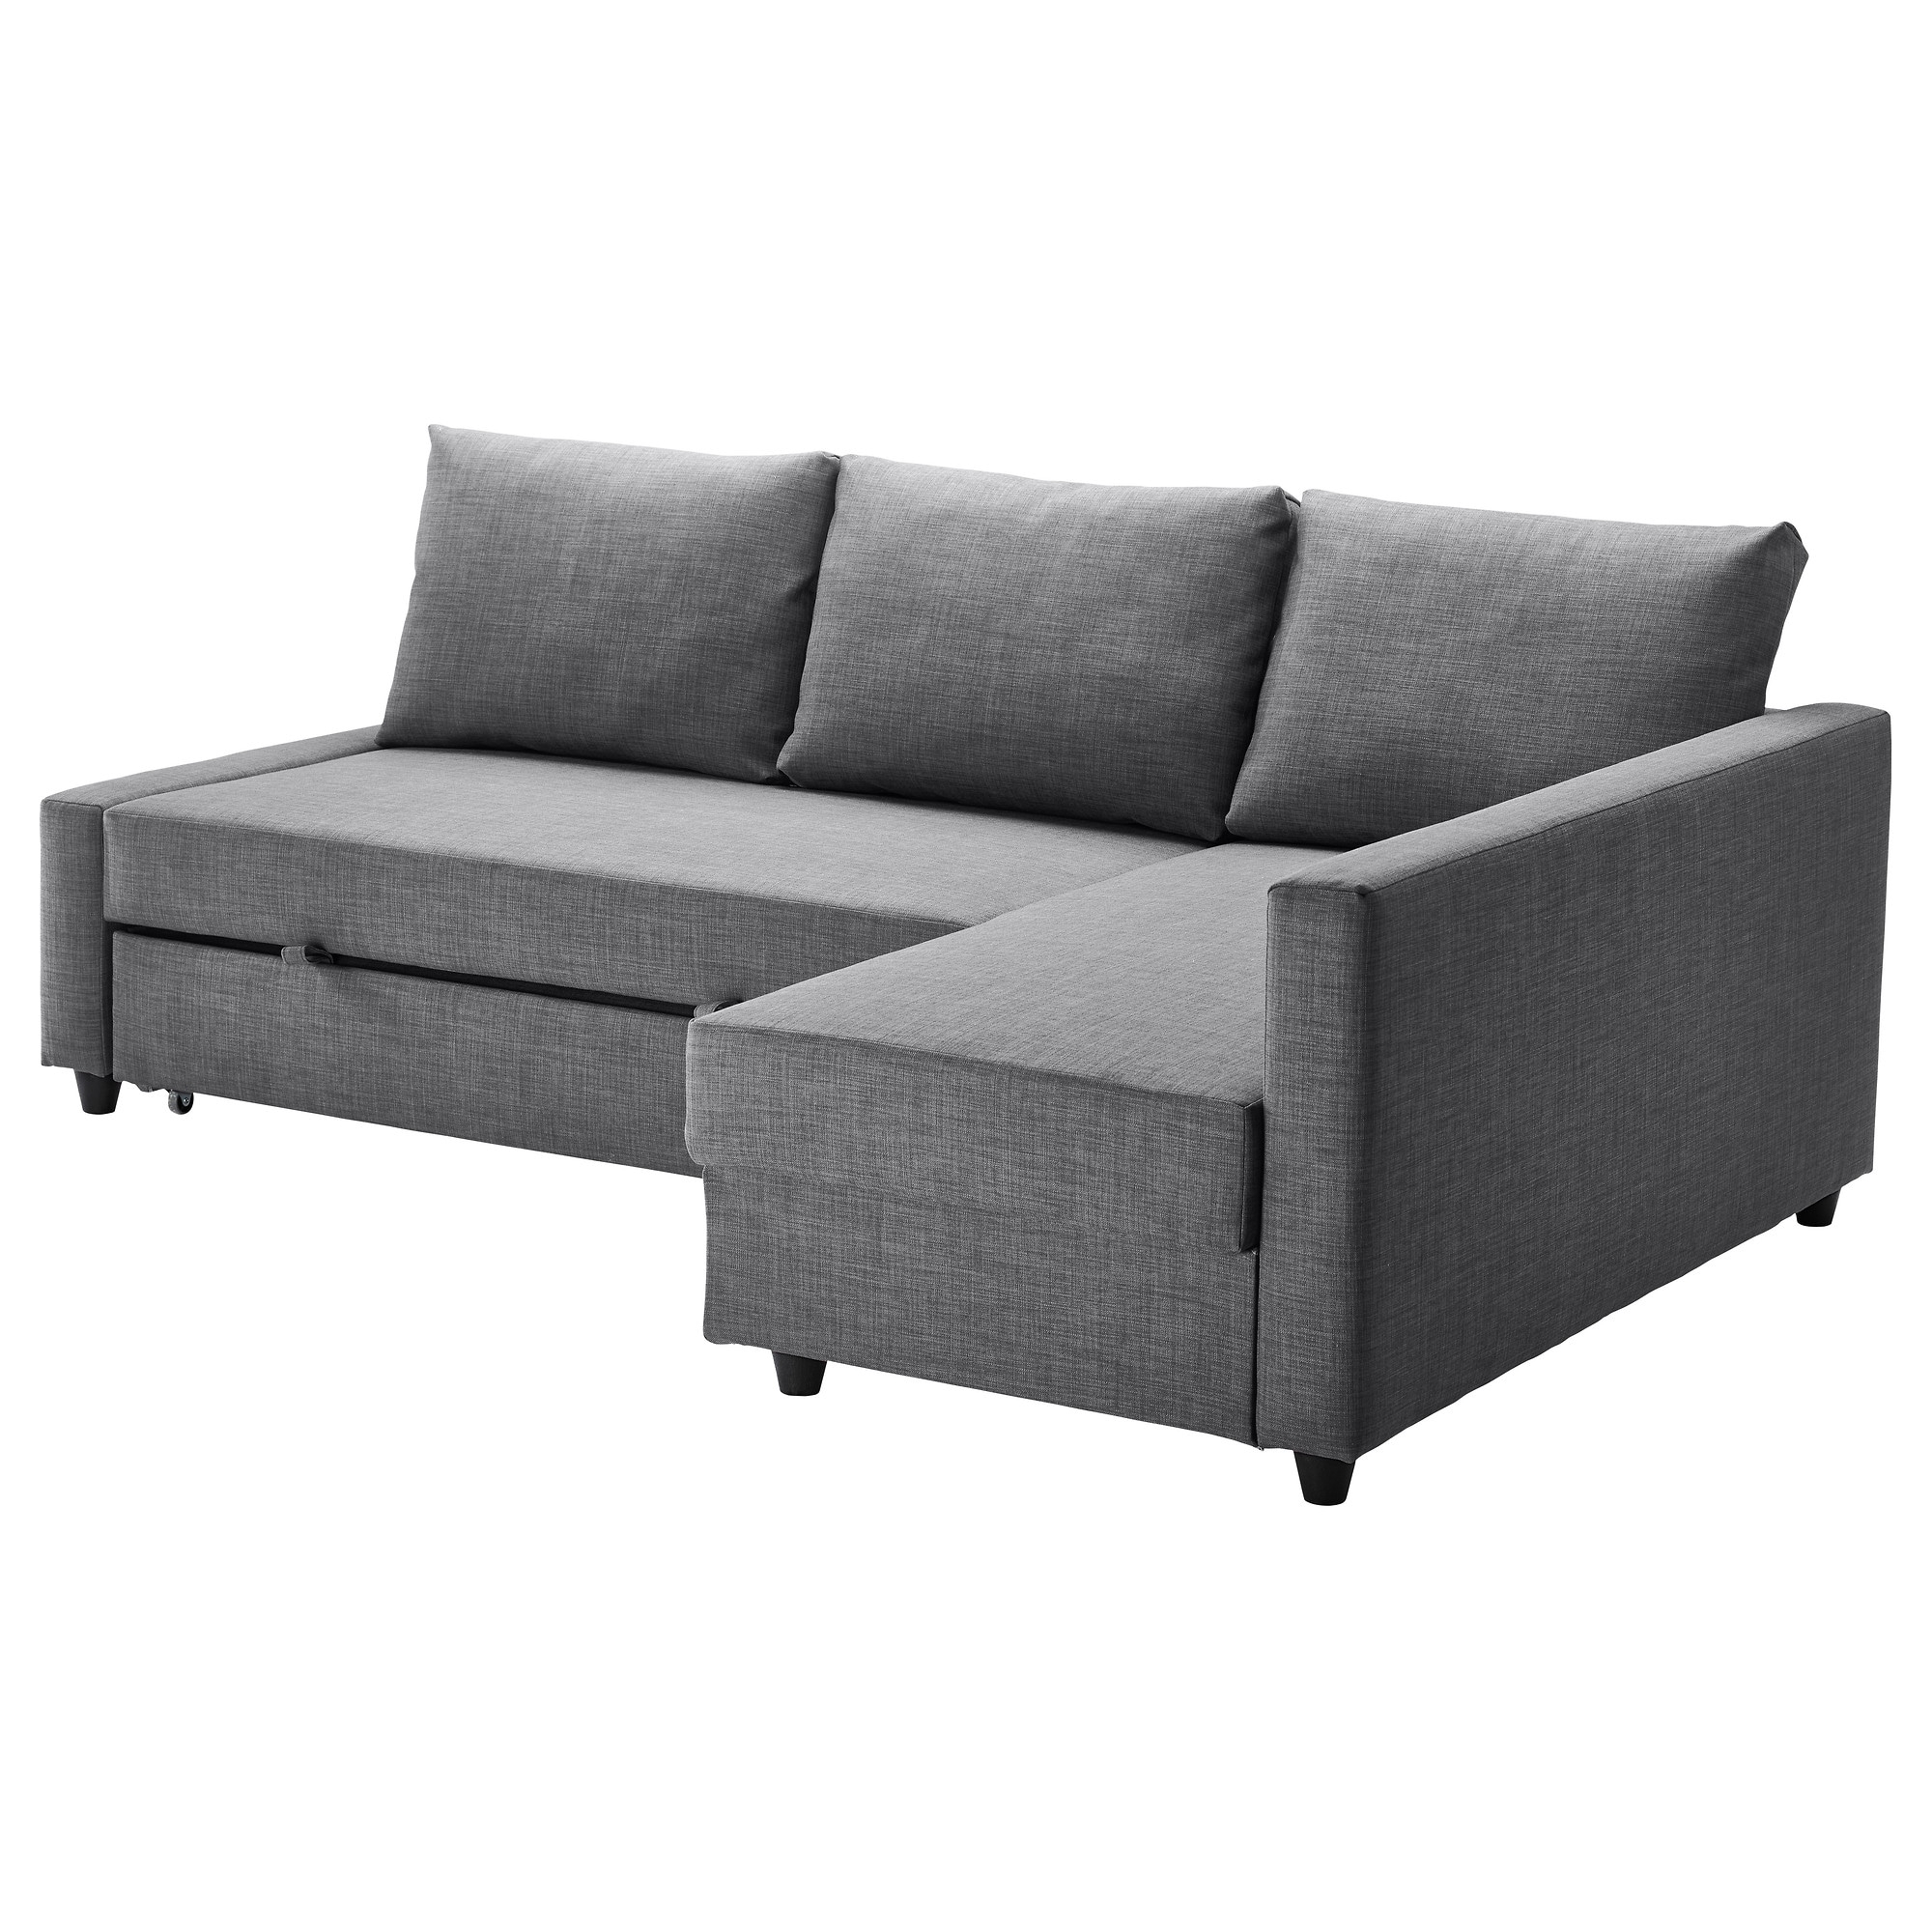 Friheten Corner Sofa Bed With Storage Skiftebo Dark Grey – Ikea In London Dark Grey Sofa Chairs (Image 6 of 25)